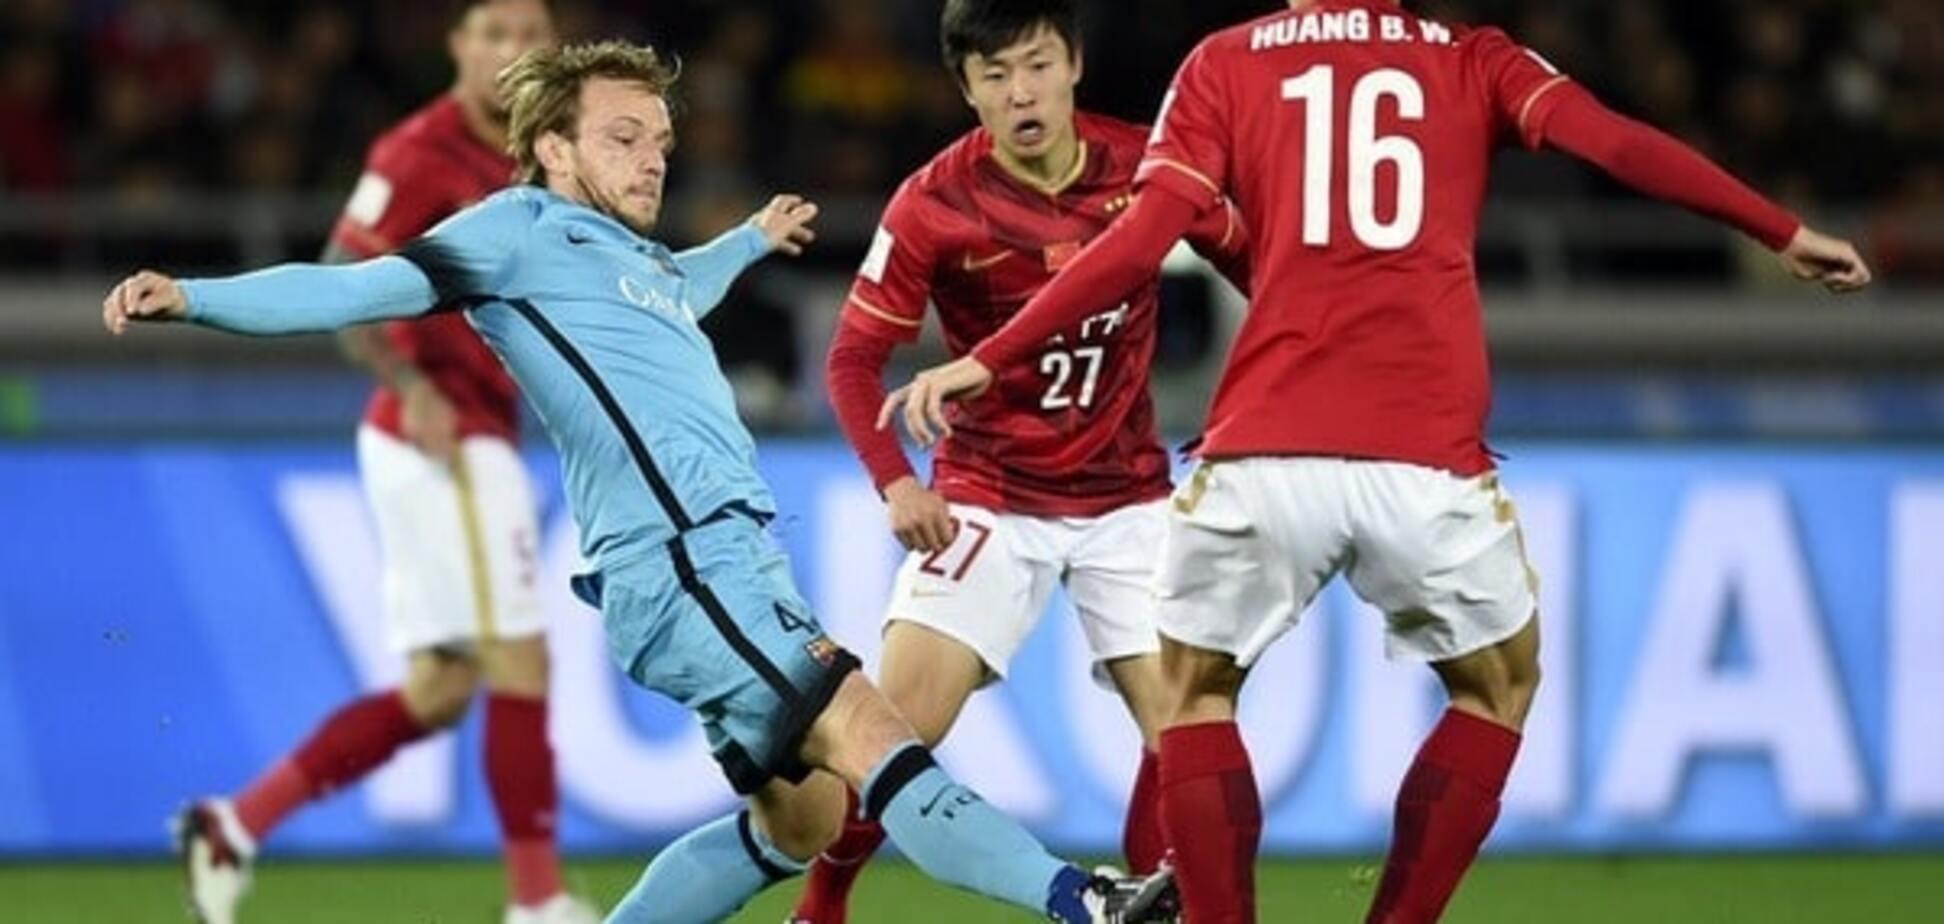 Барселона – Гуанчжоу – 3-0: видео-обзор матча